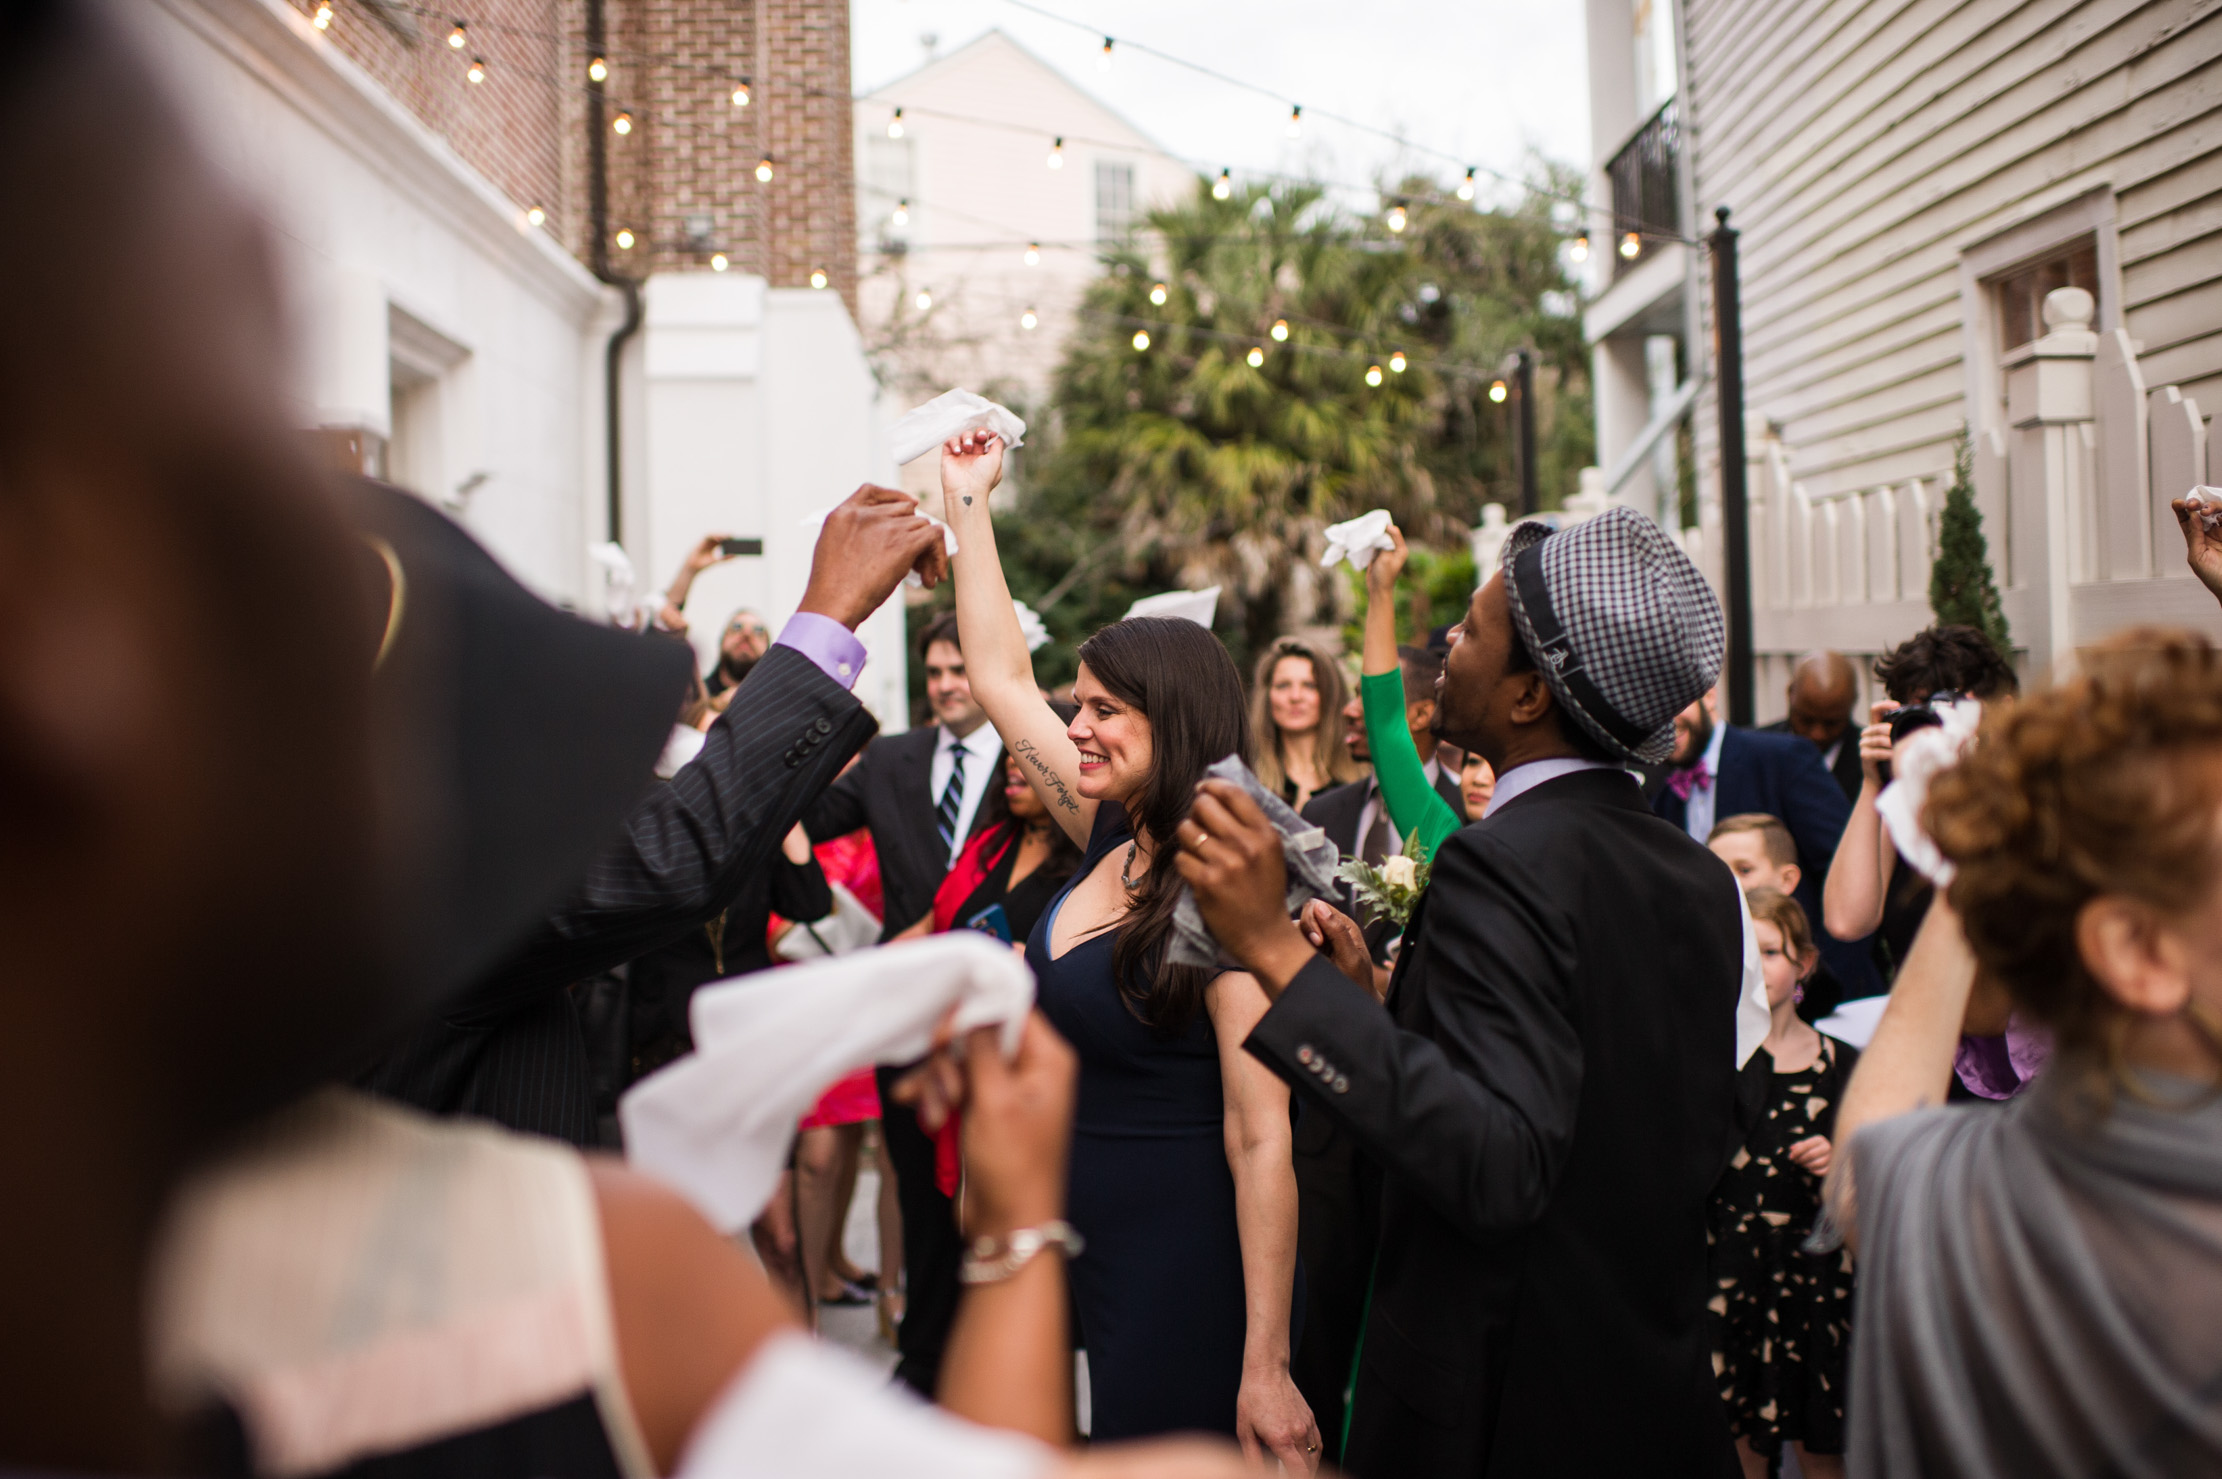 NOLA-Felicity-Church-Ace-Hotel-Wedding-1086.jpg